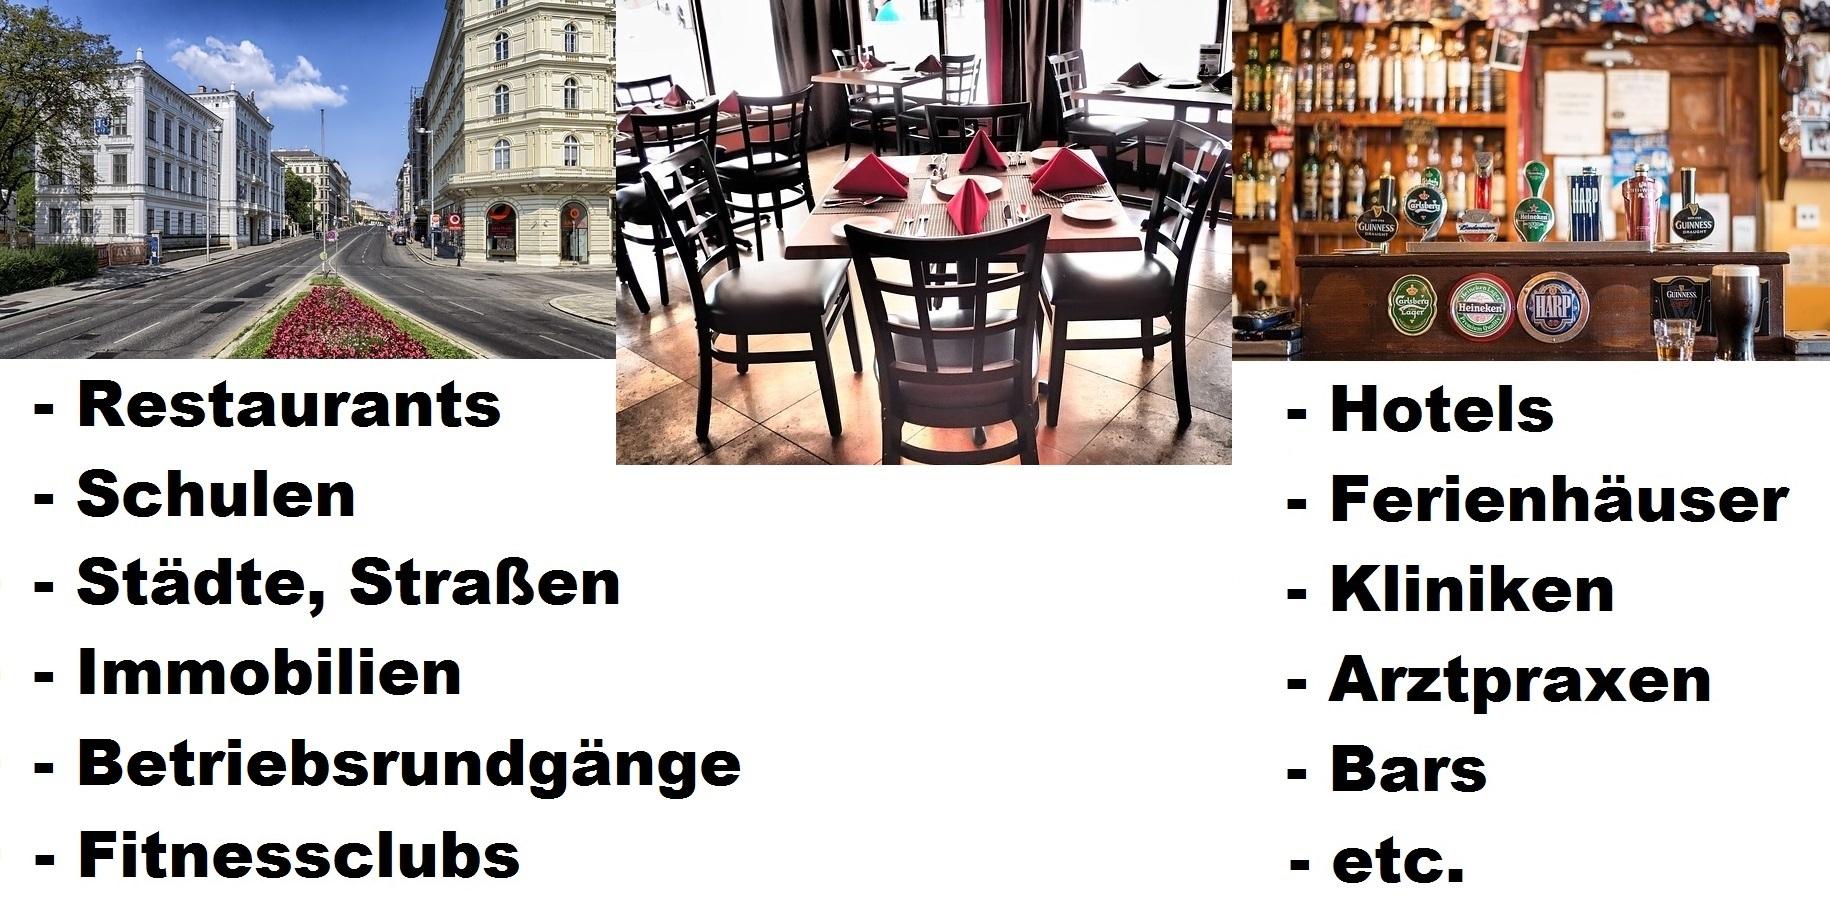 Hotels, Ferienhäuser, Kliniken, Arztpraxen, Bars, Fitnessclubs, Restaurants, Schulen, Städte, Straßen, Immobilien, Betriebsrundgänge